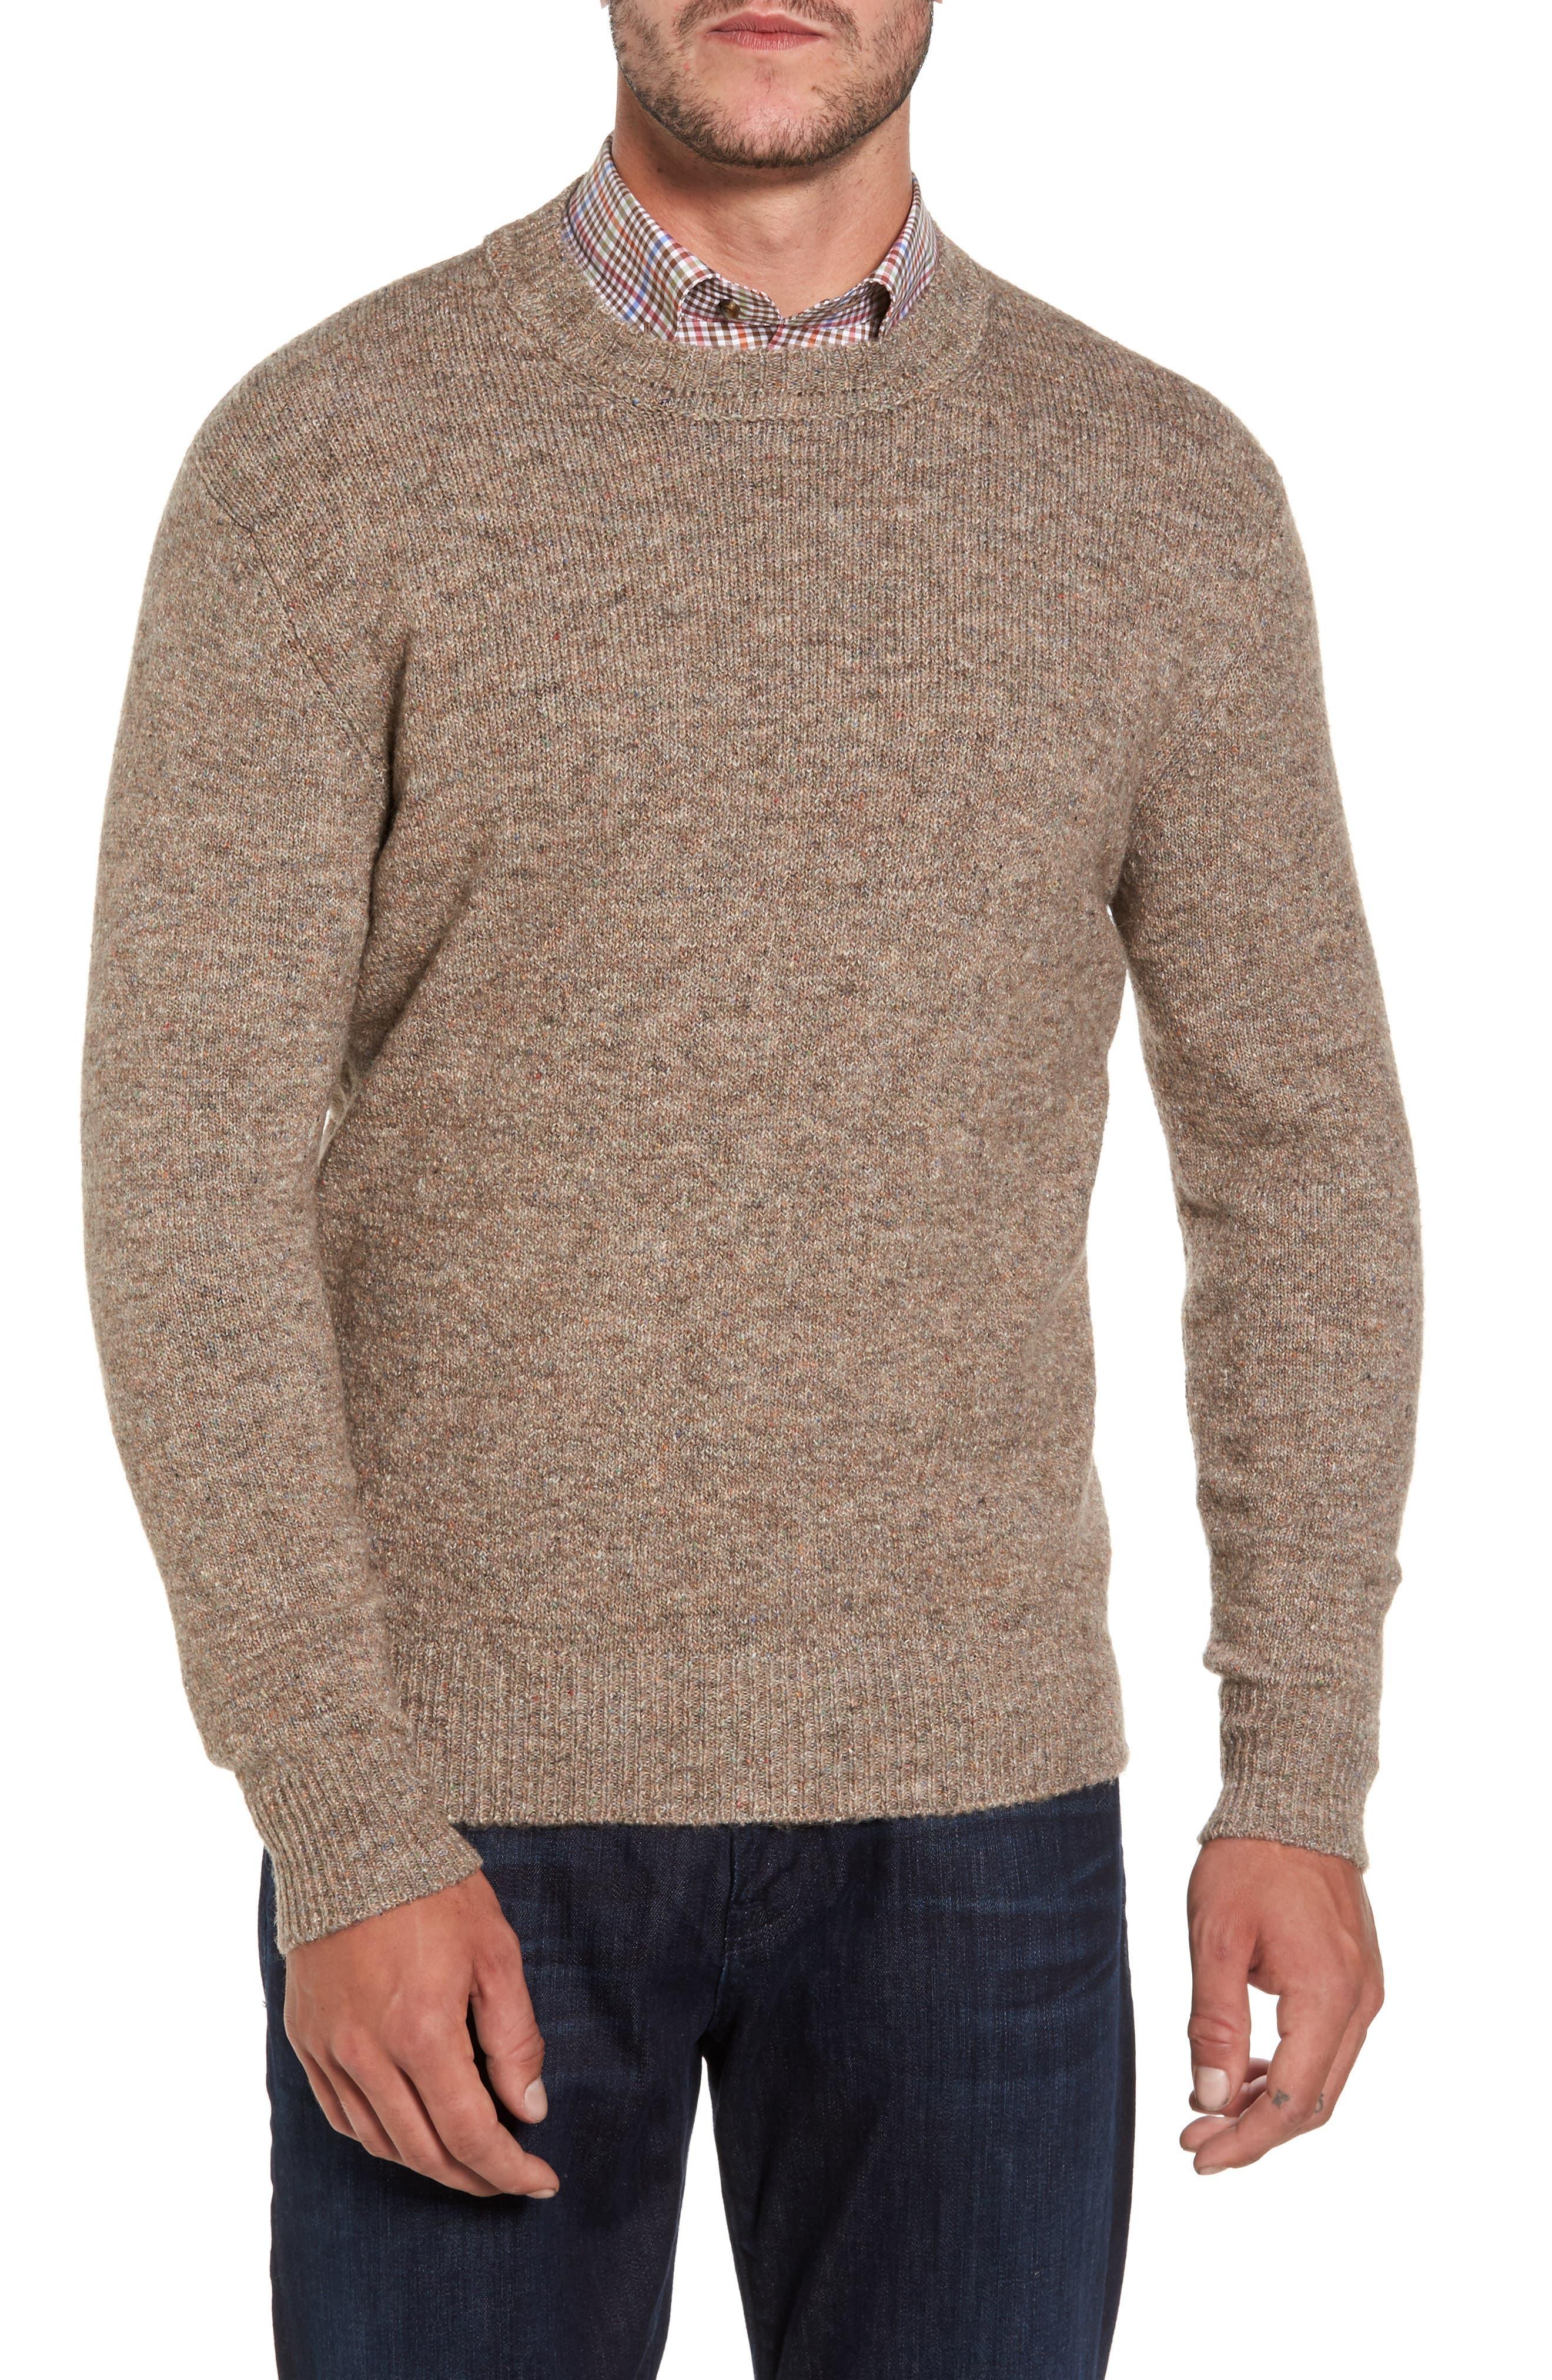 Tweed Crewneck Sweater,                             Main thumbnail 1, color,                             285